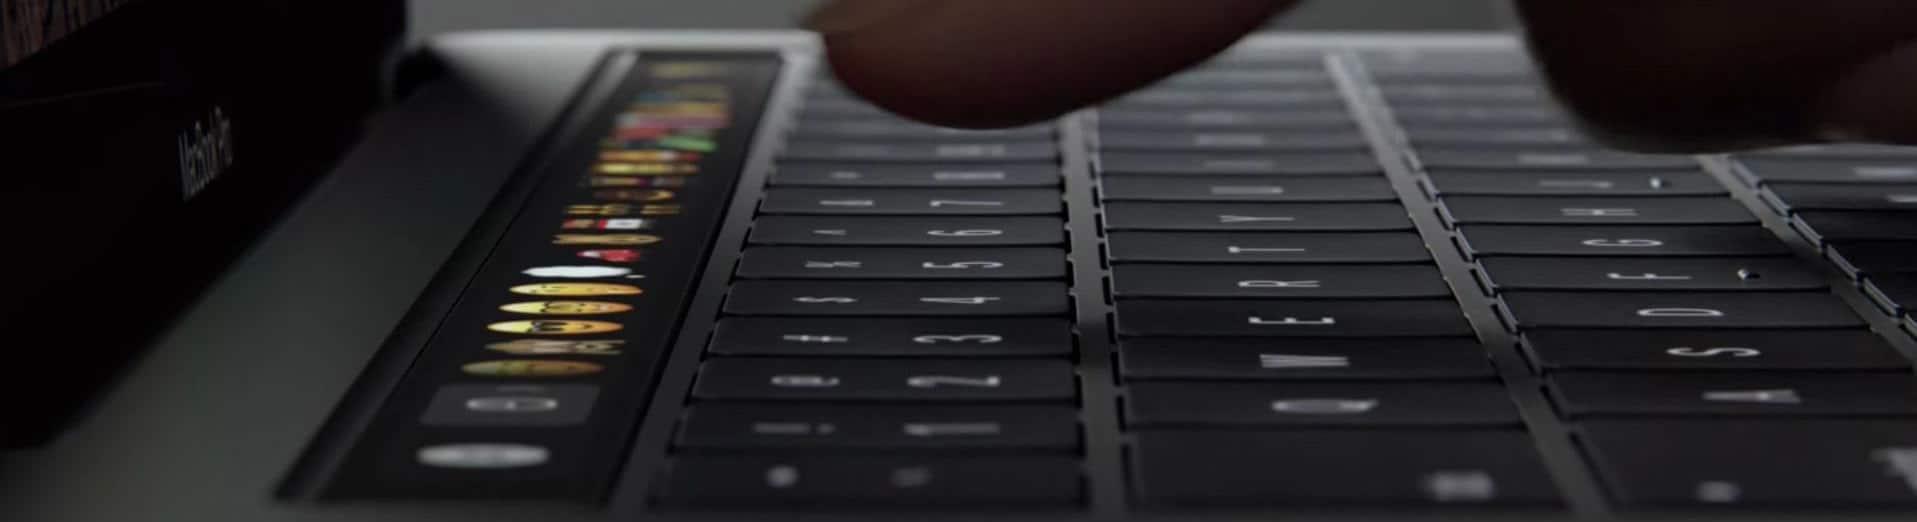 Macbook Pro Touchpad